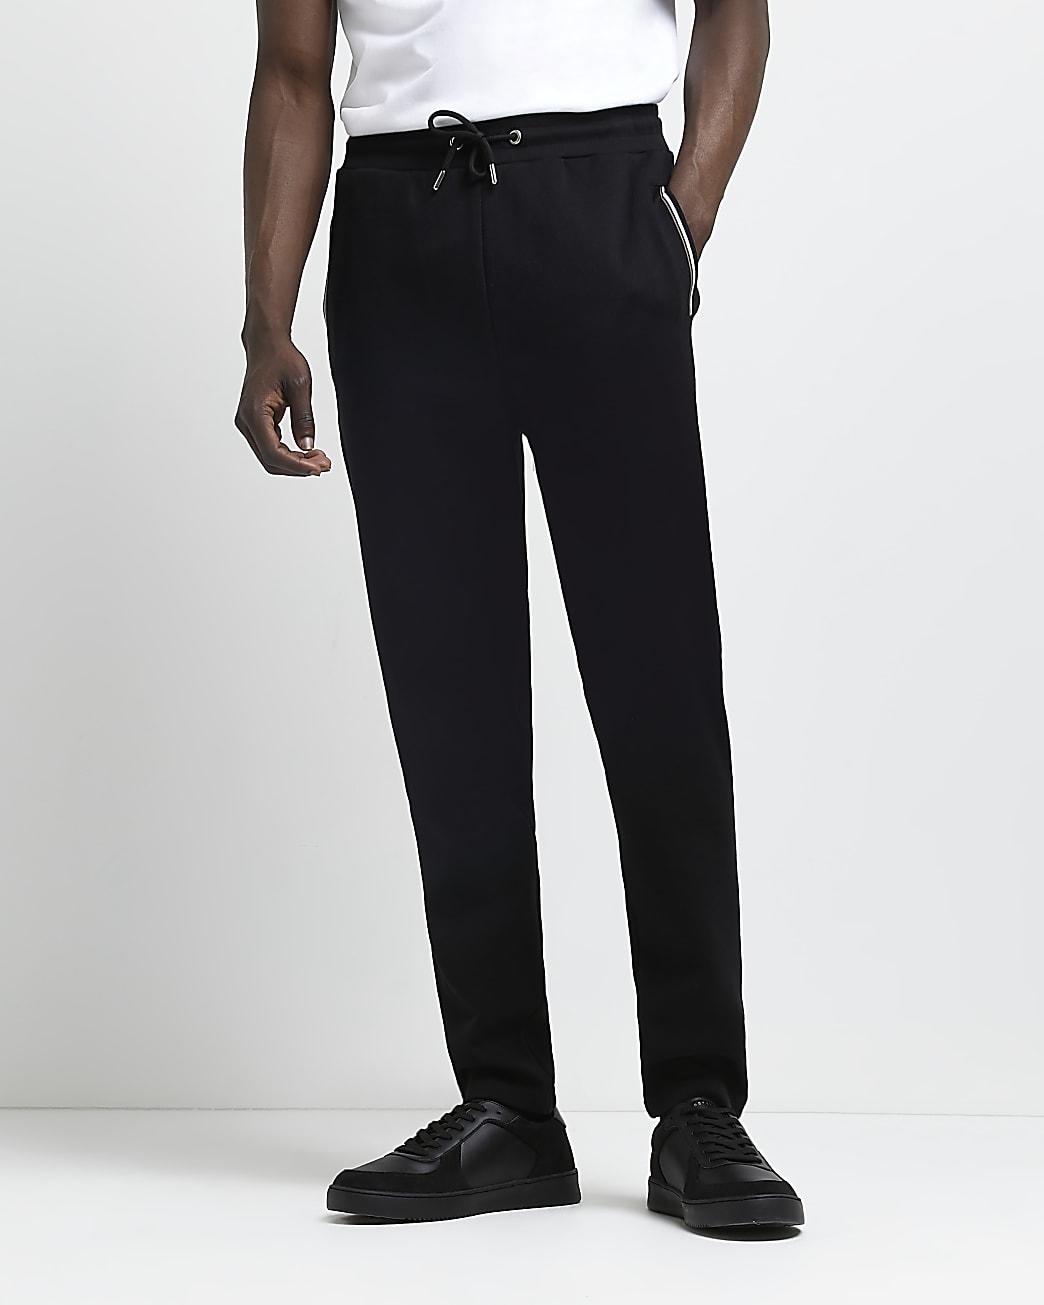 Black slim fit pocket stripe joggers